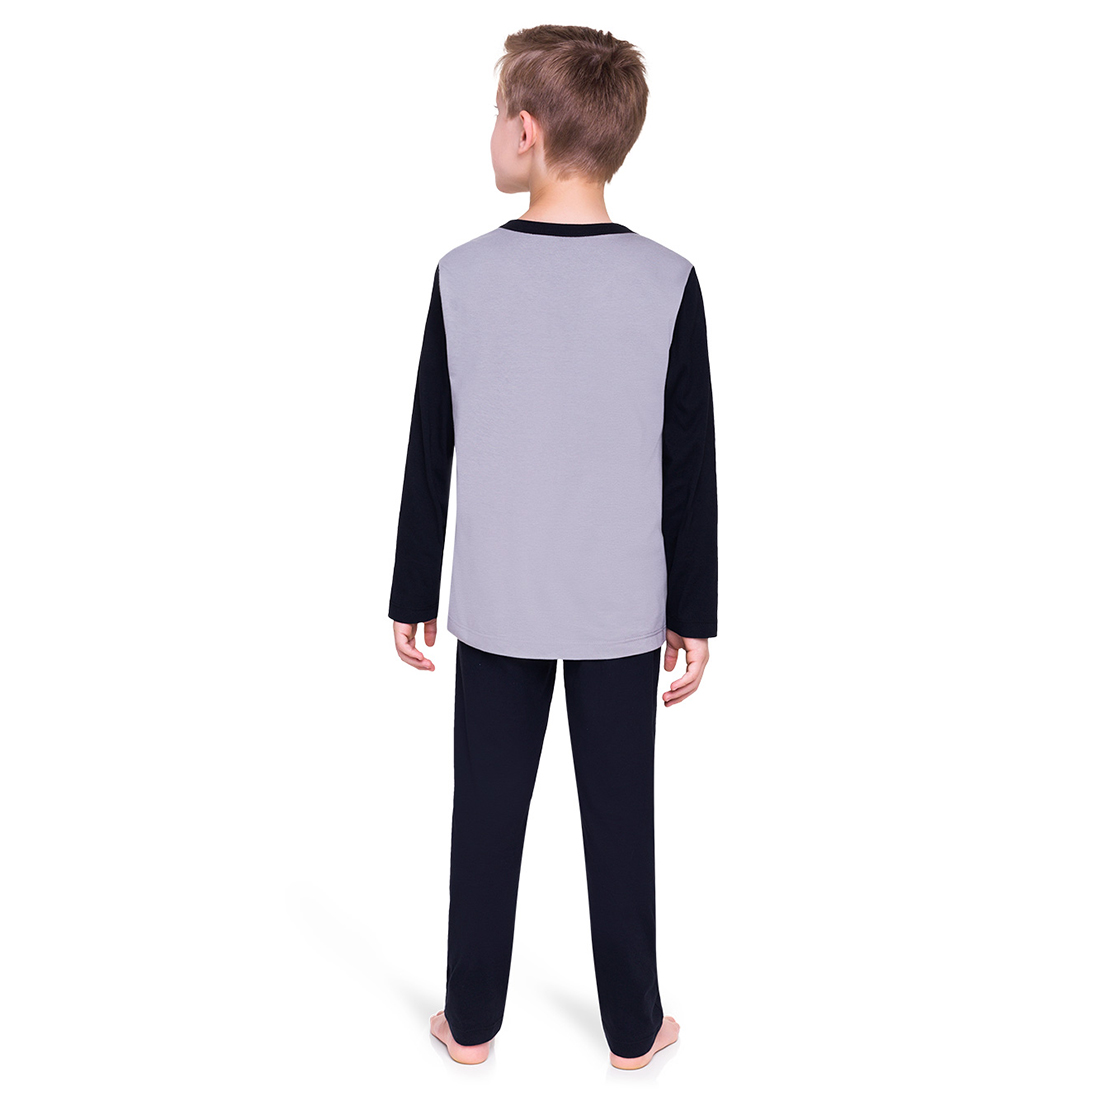 Pijama infantil menino inverno batman mascara de brinde veggi